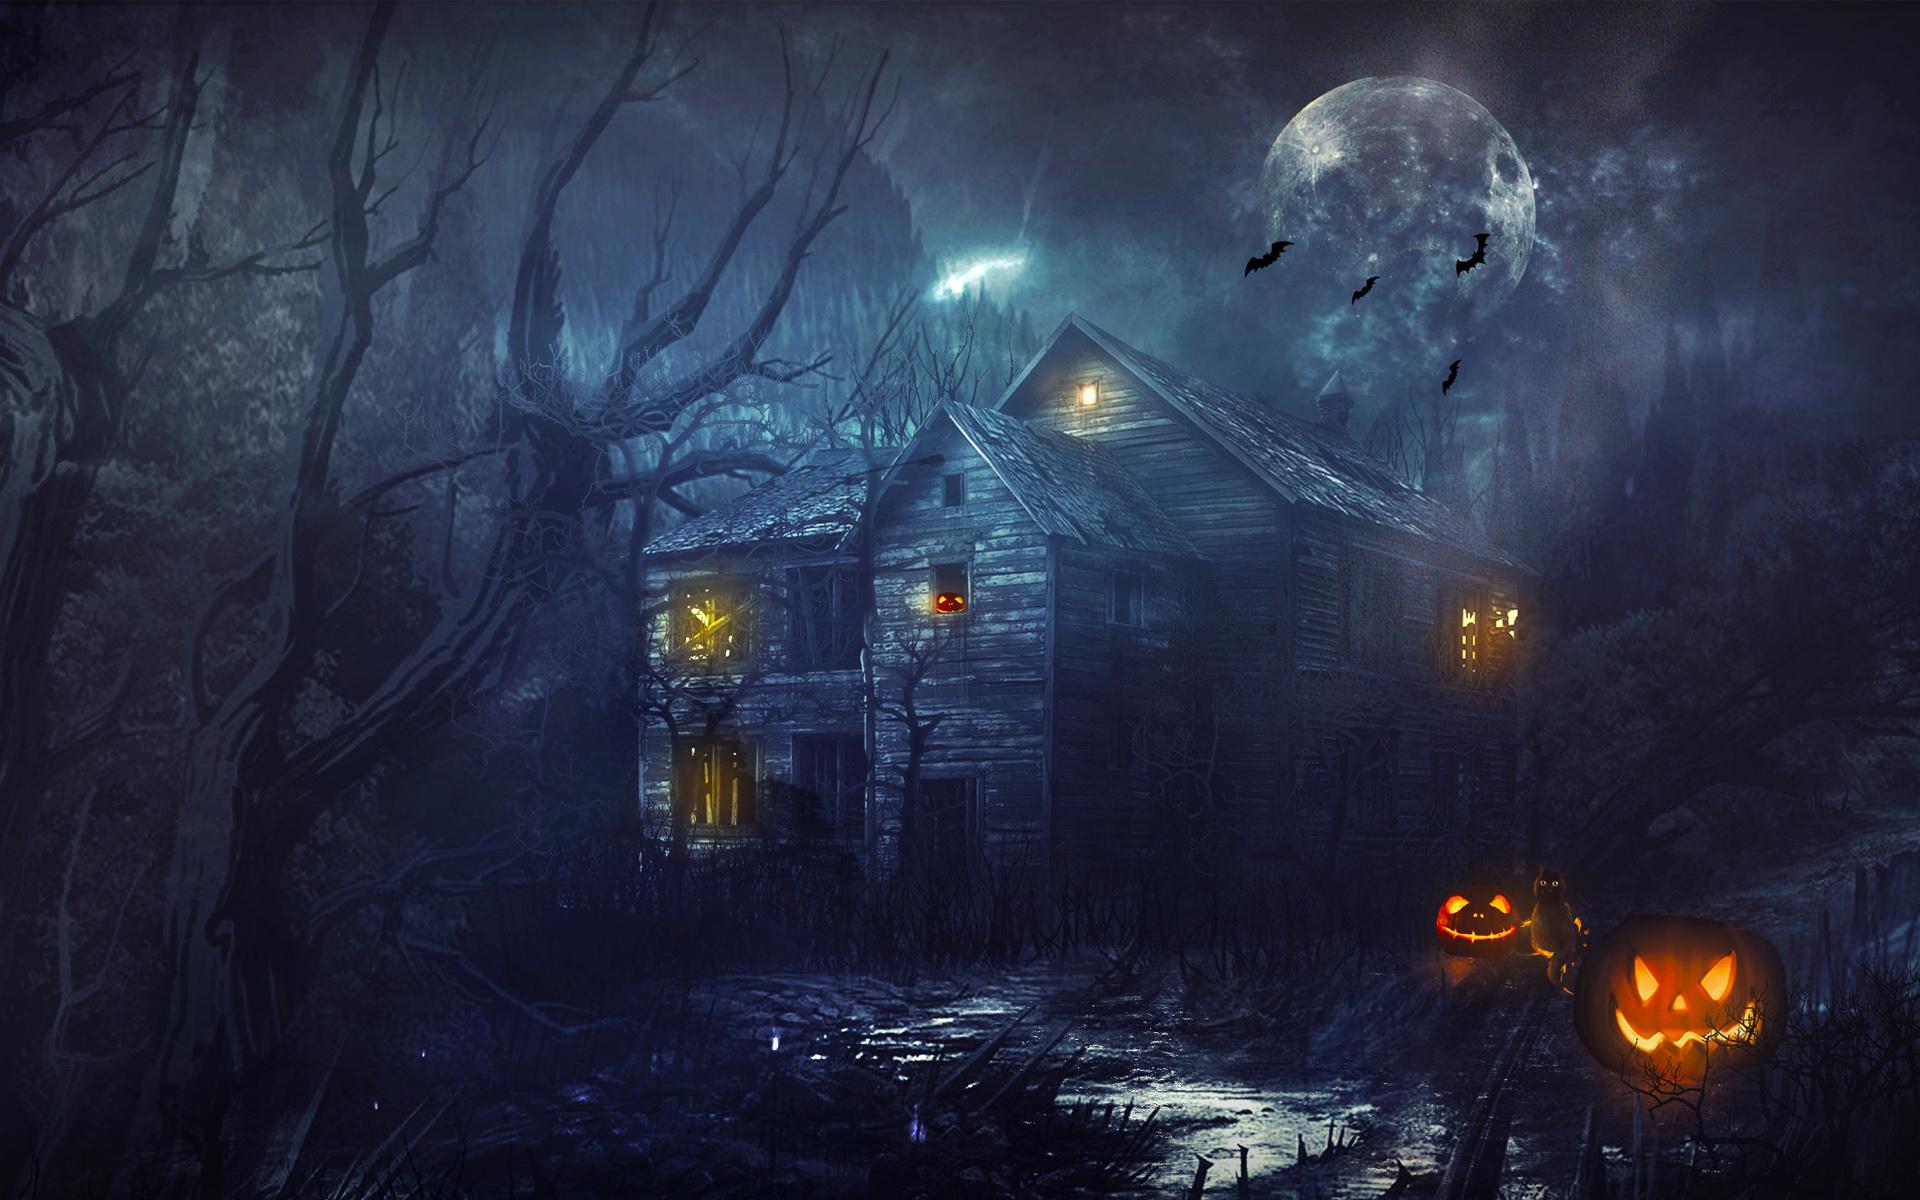 Era la notte di Halloween